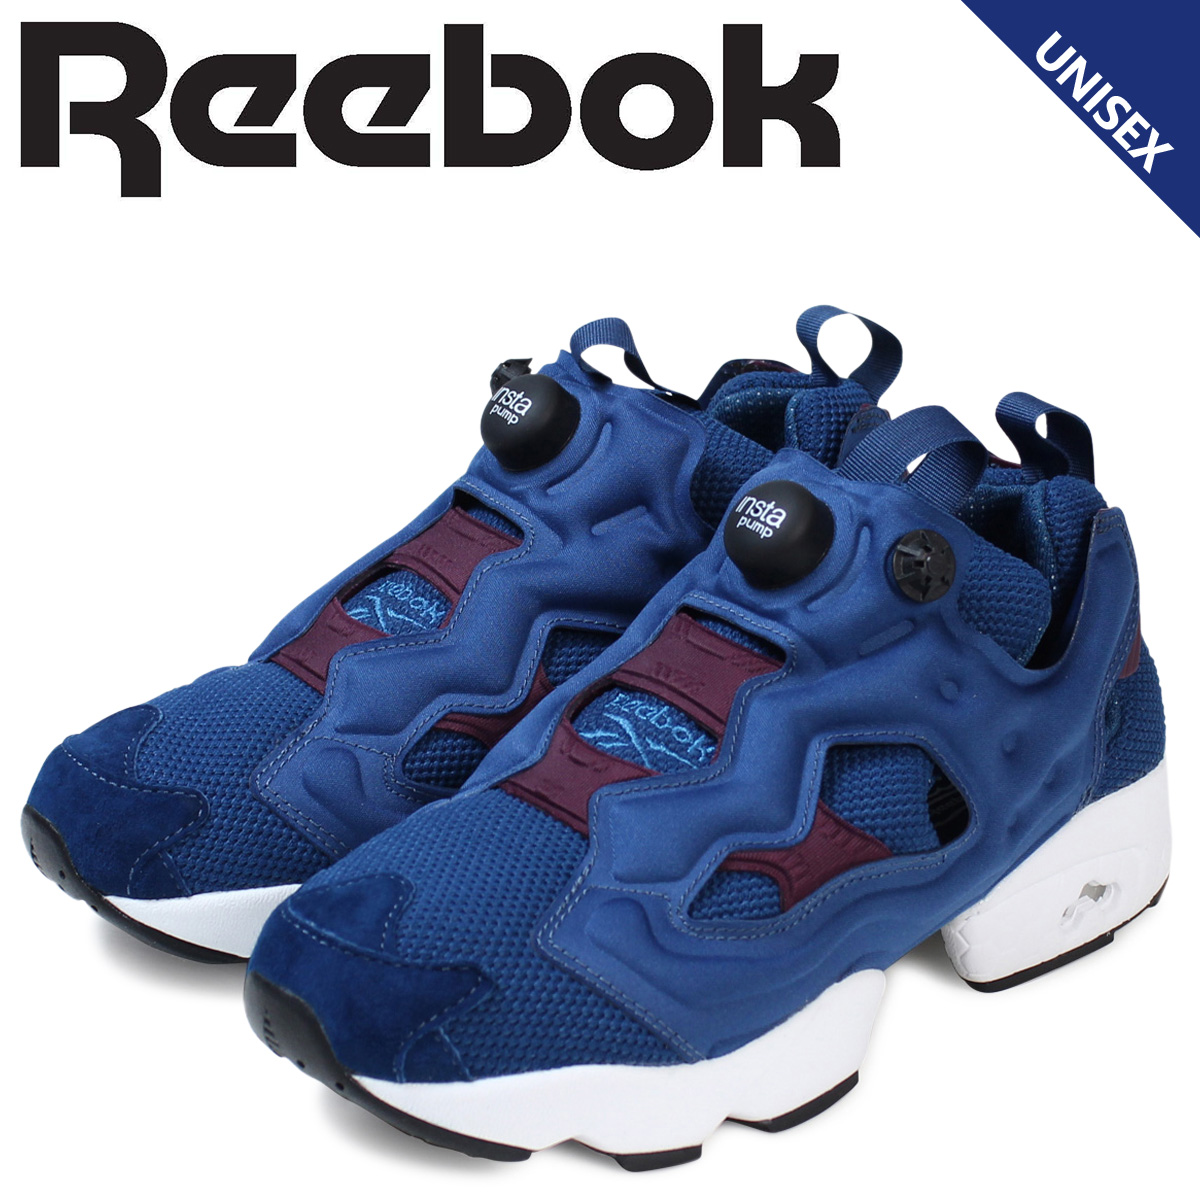 Get > reebok insta pump fury hk > OFF 60% | onyxgraham